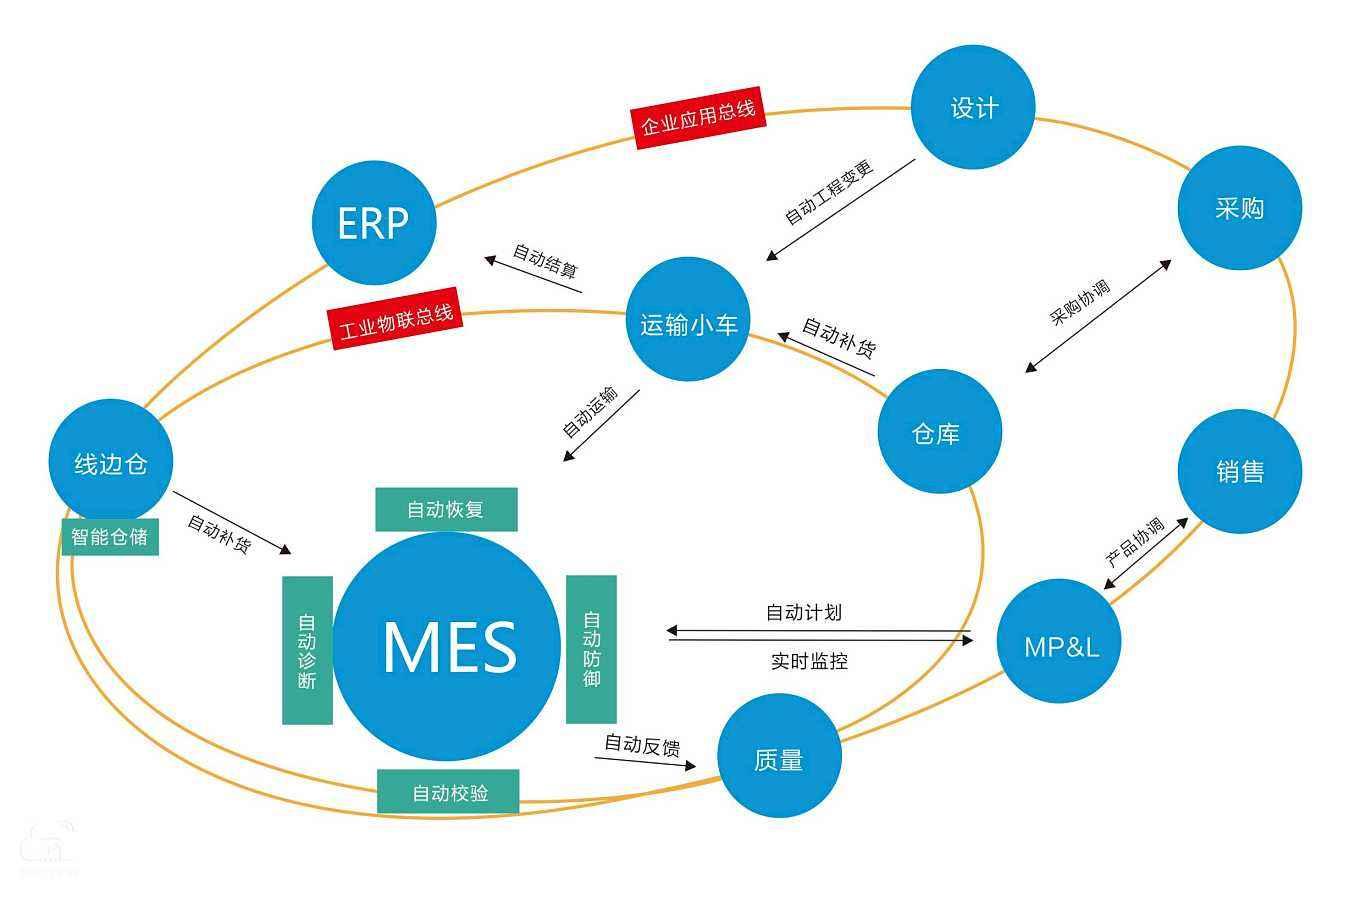 MES系统软件实施失败原因及借鉴经验总结